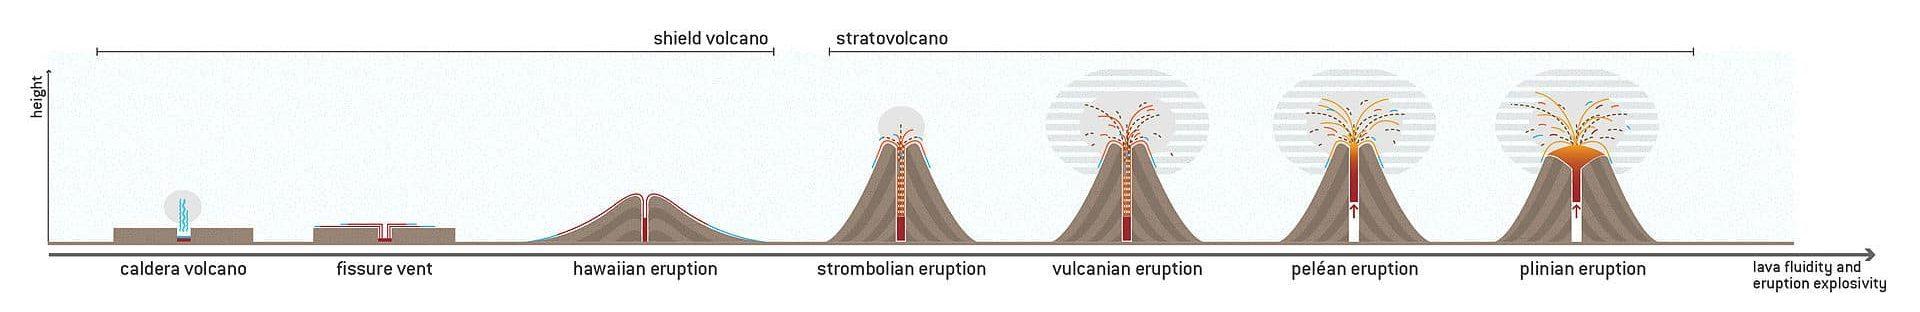 stratovolcano schema agung explosive bali